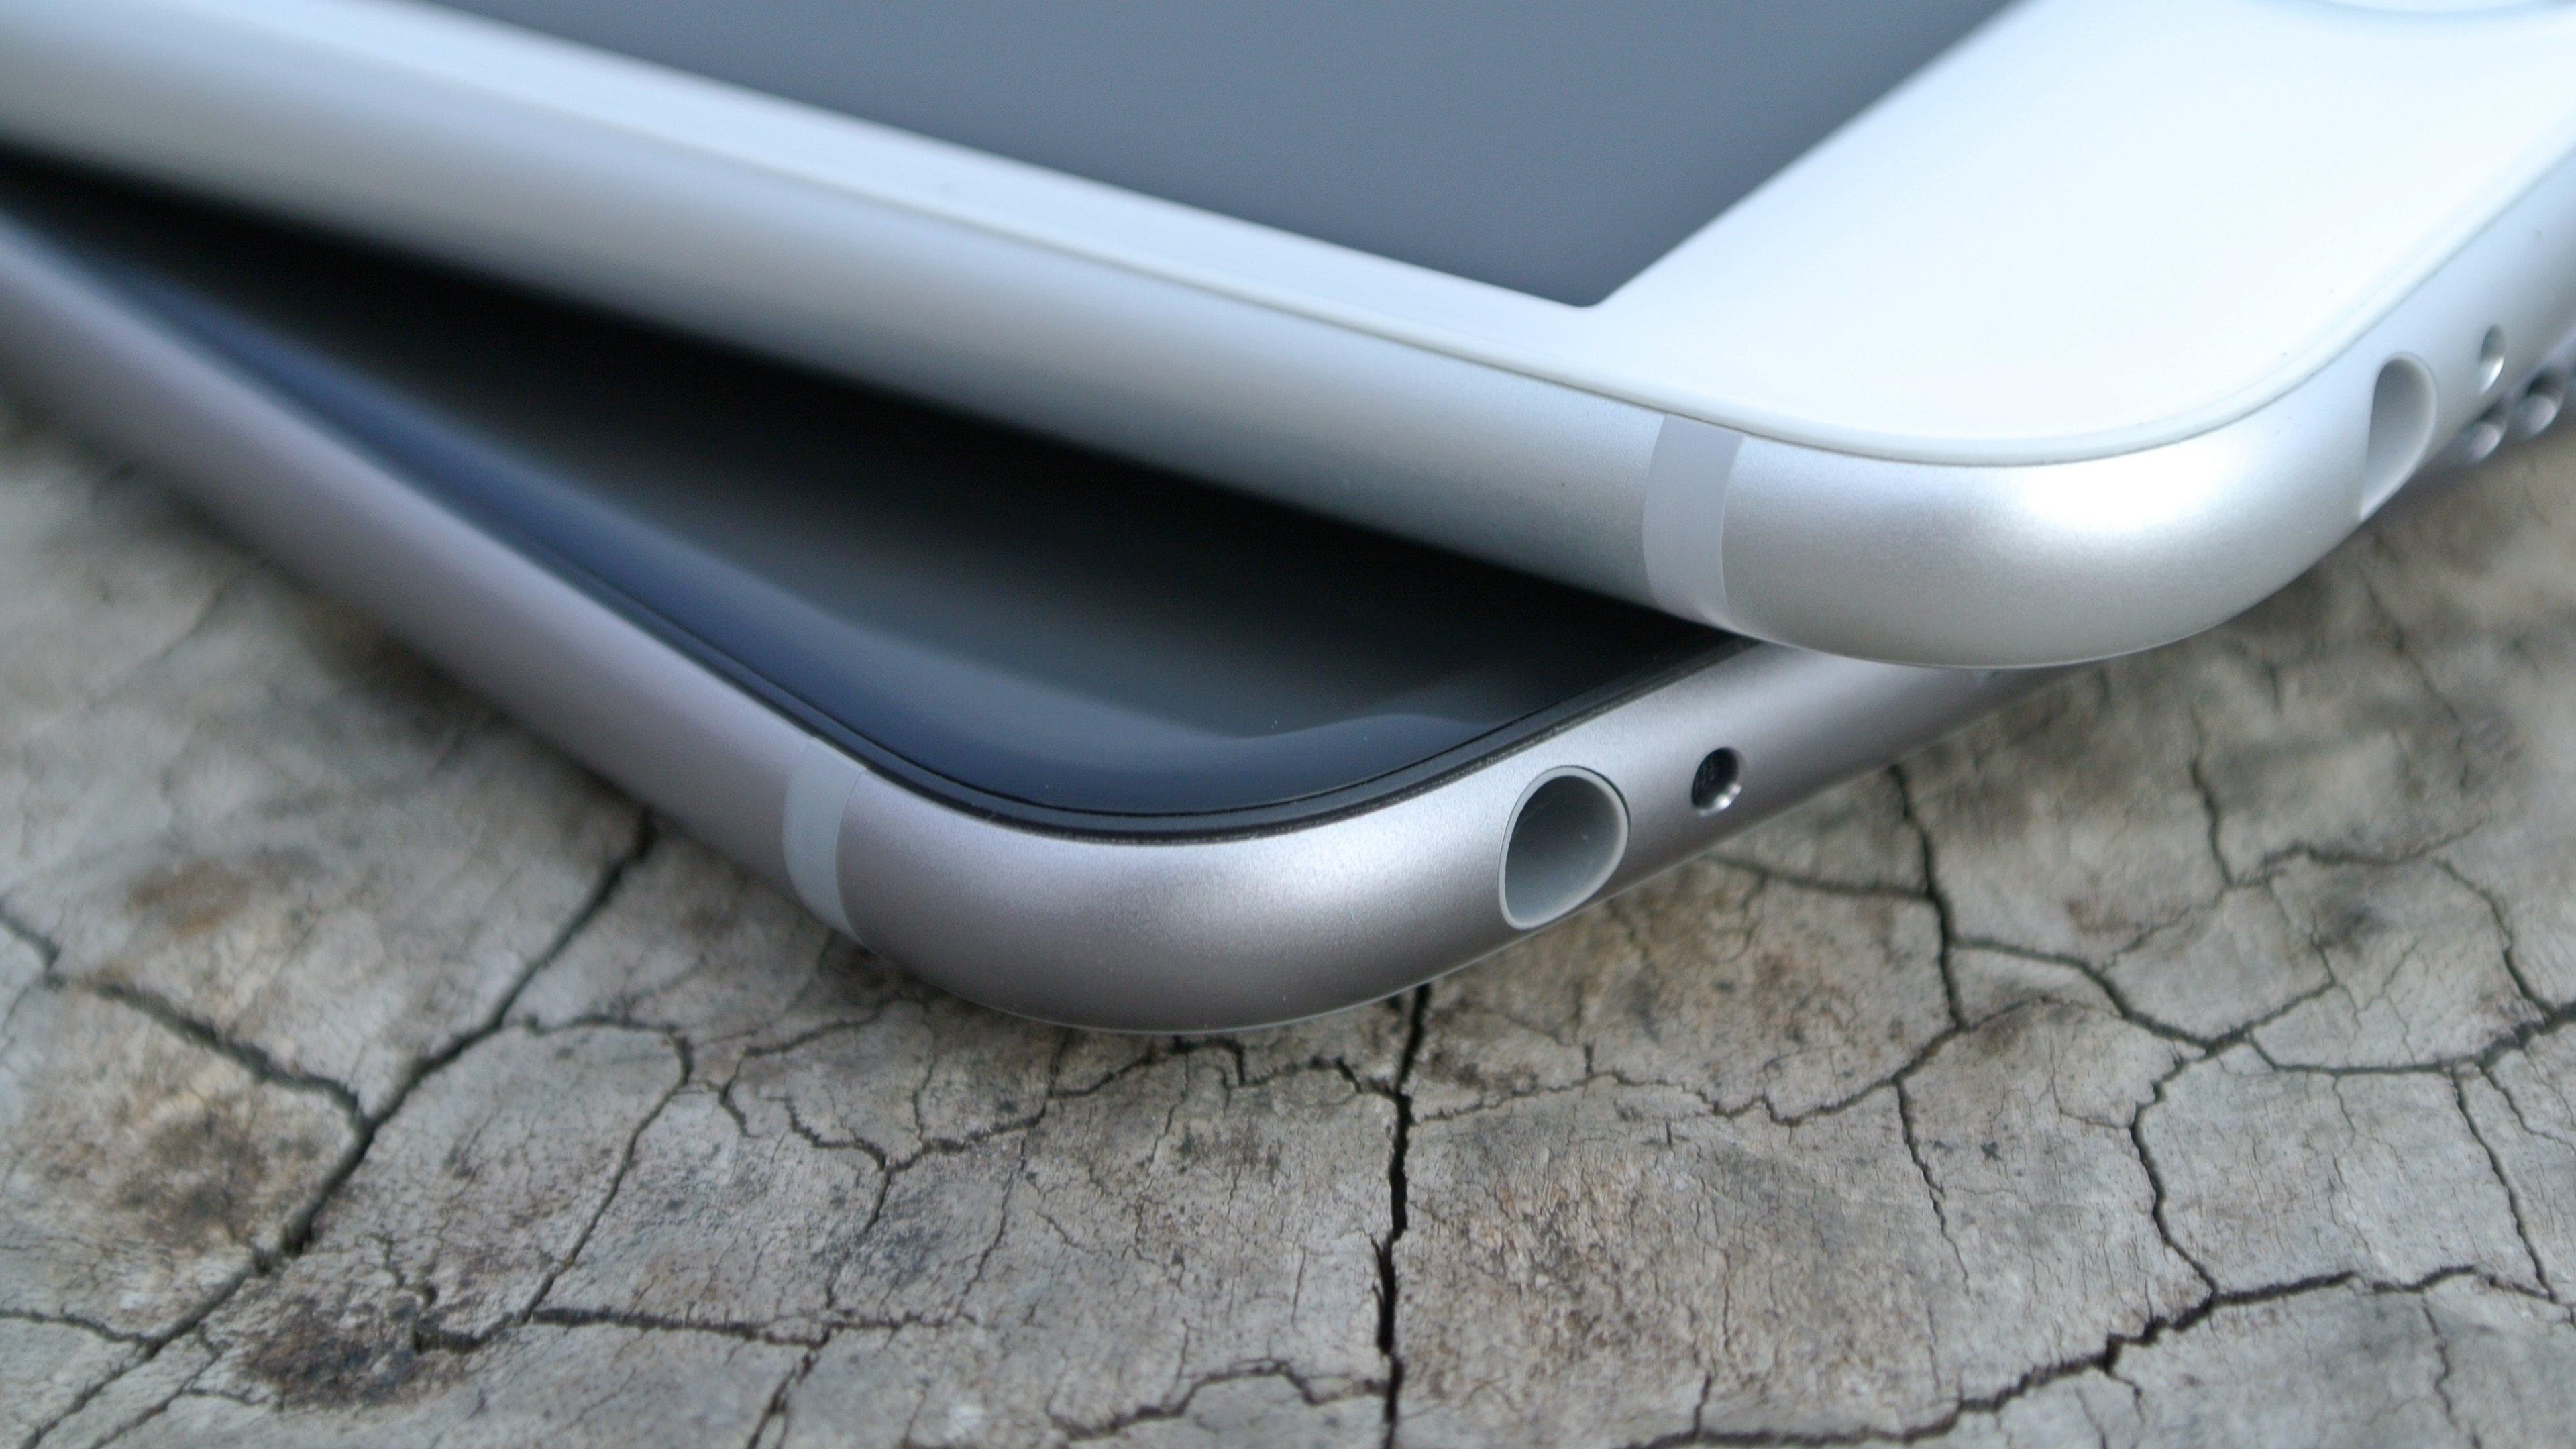 iphone iphone 6 apple Ultra HD Wallpaper 4k 3840x2160   HD 3840x2160